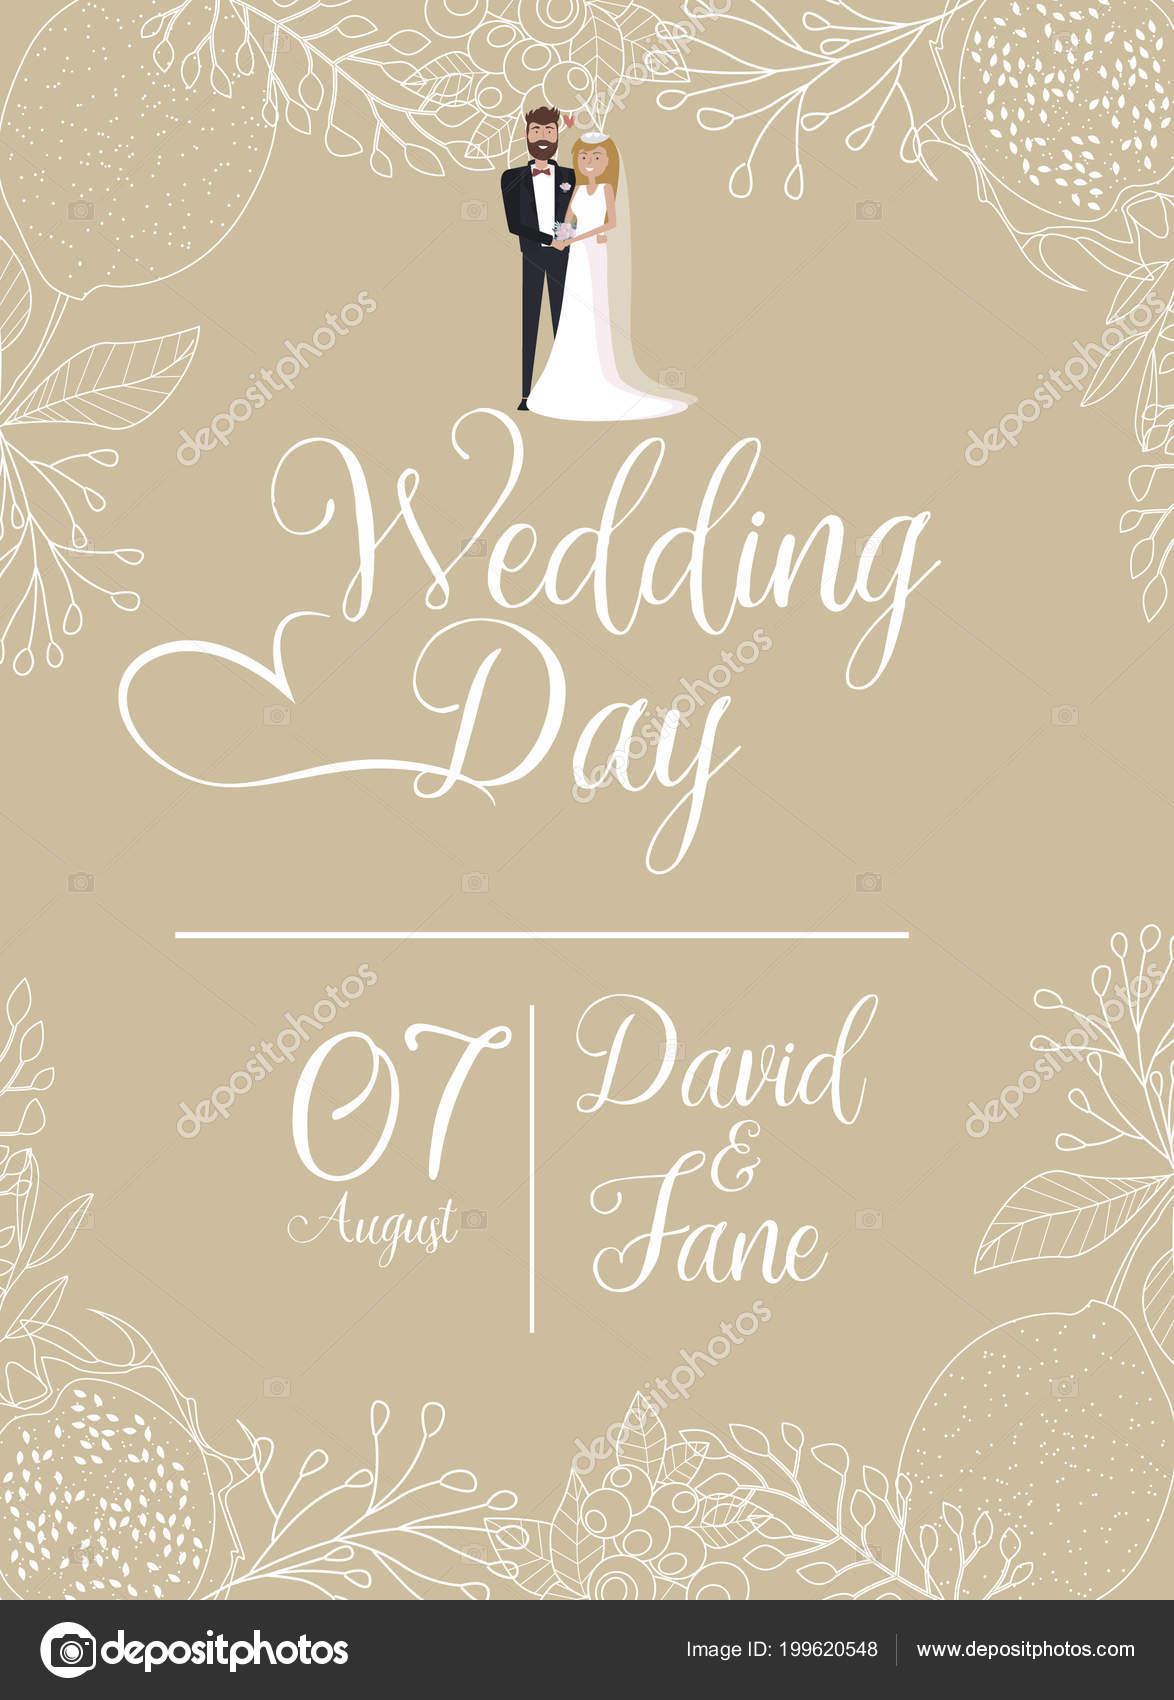 wedding day invitation card groom bride floral design editable